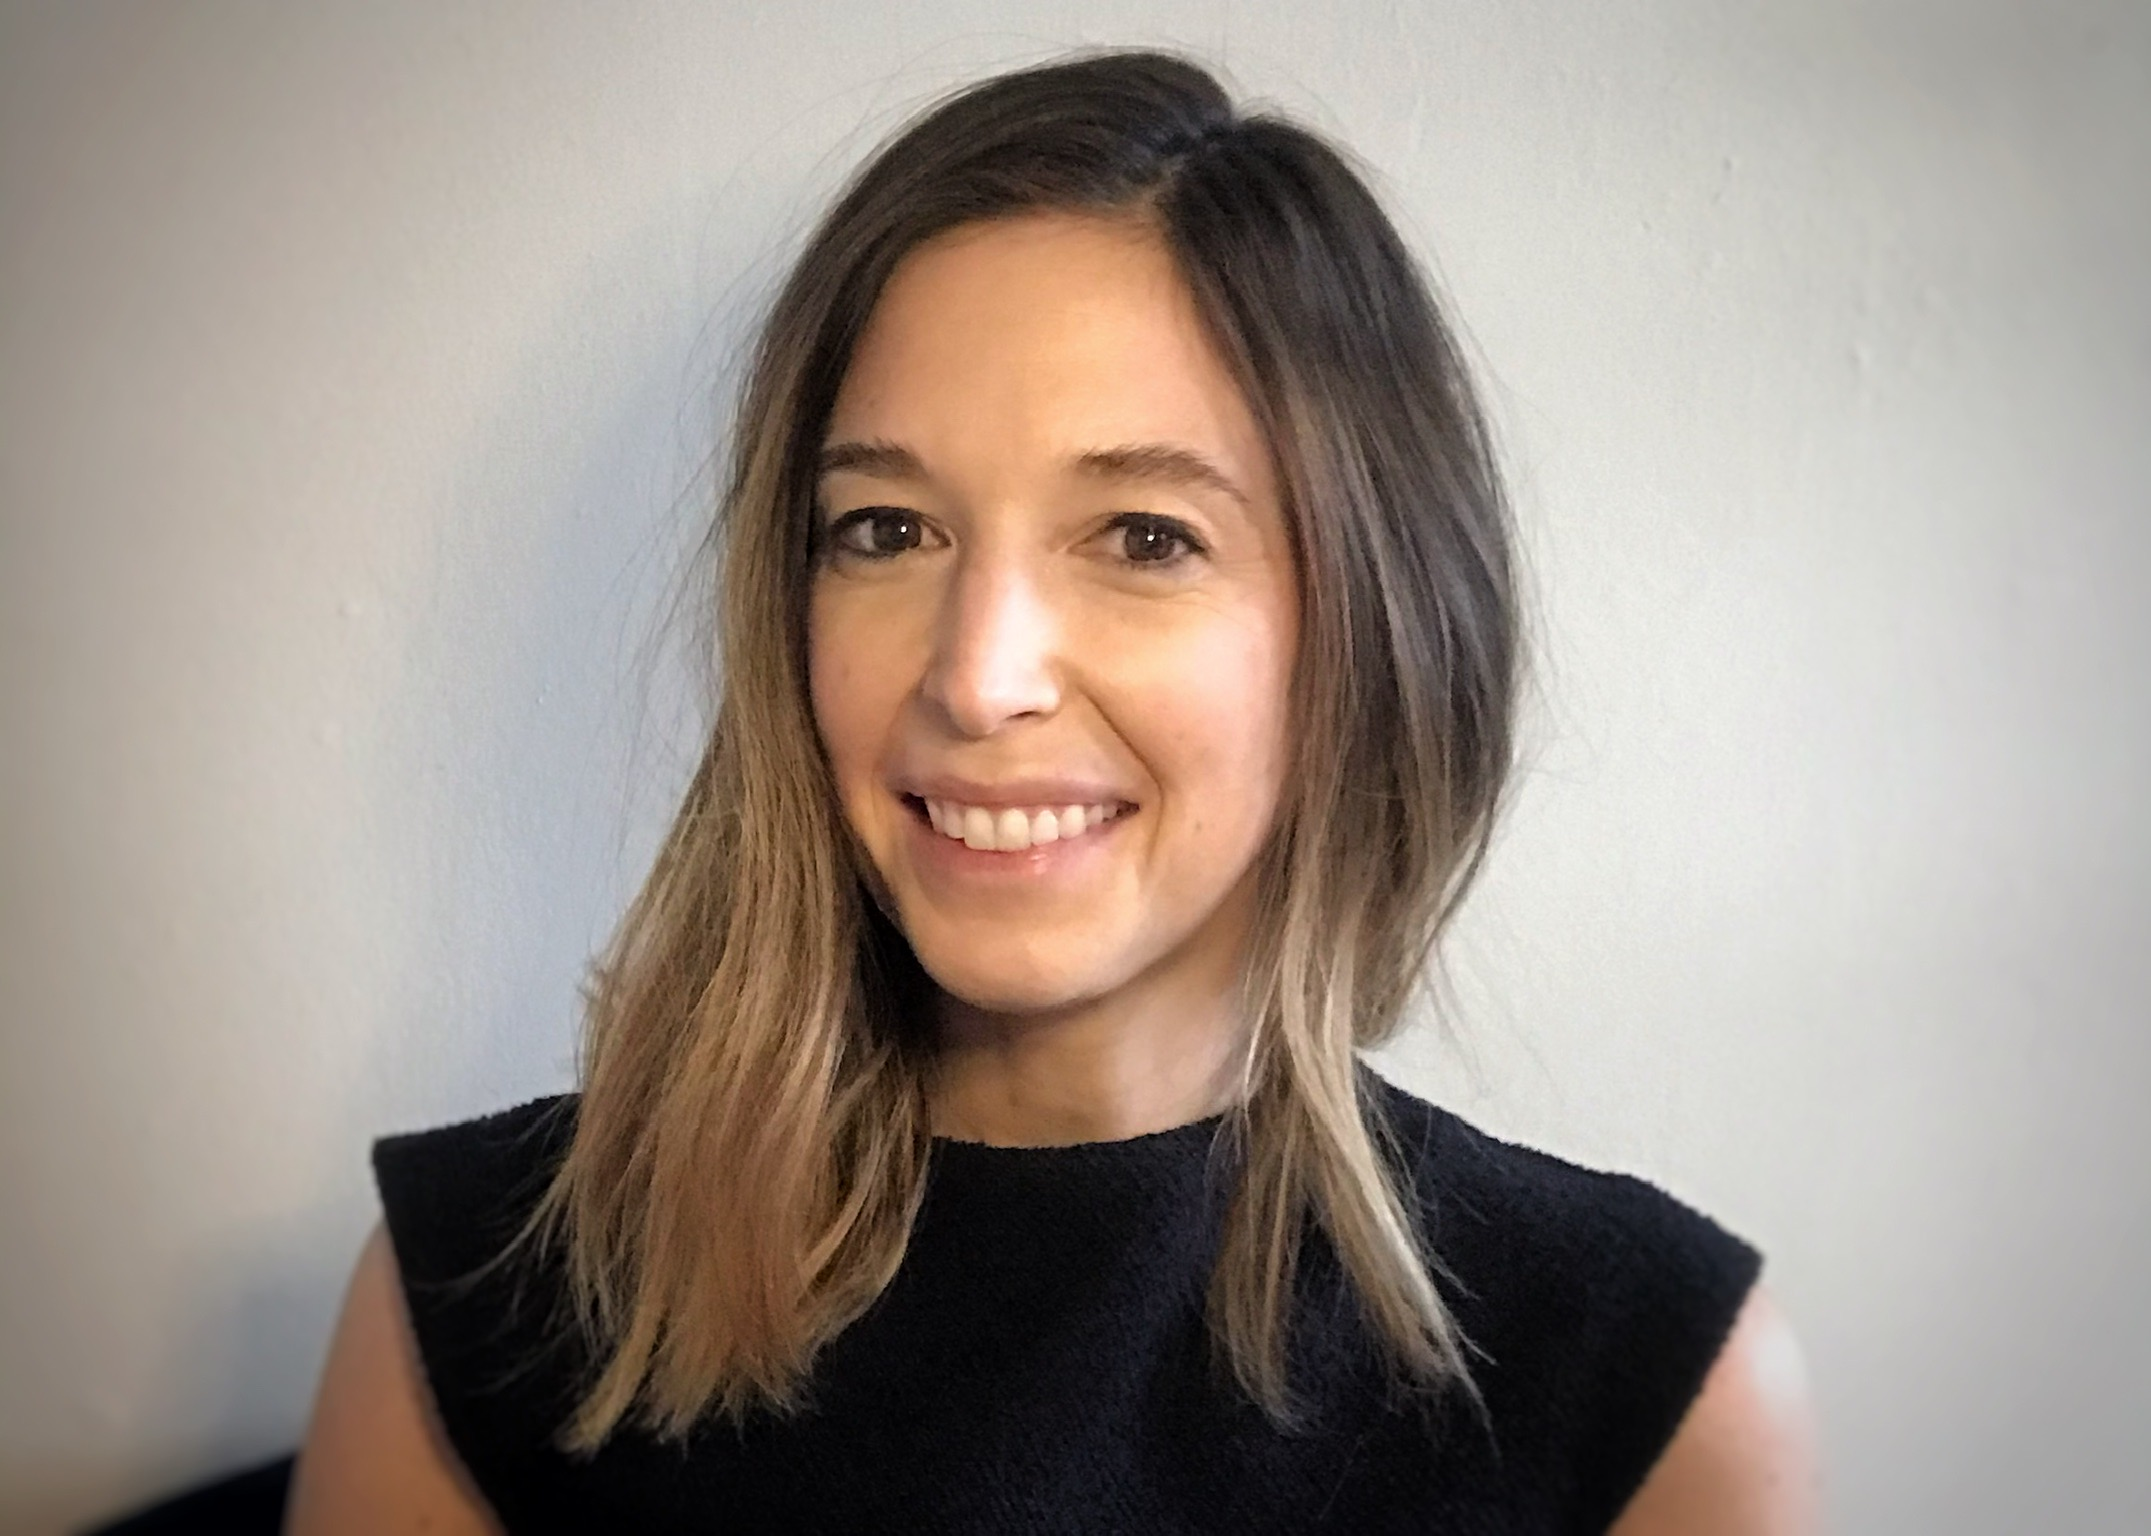 Sarah Higginbotham